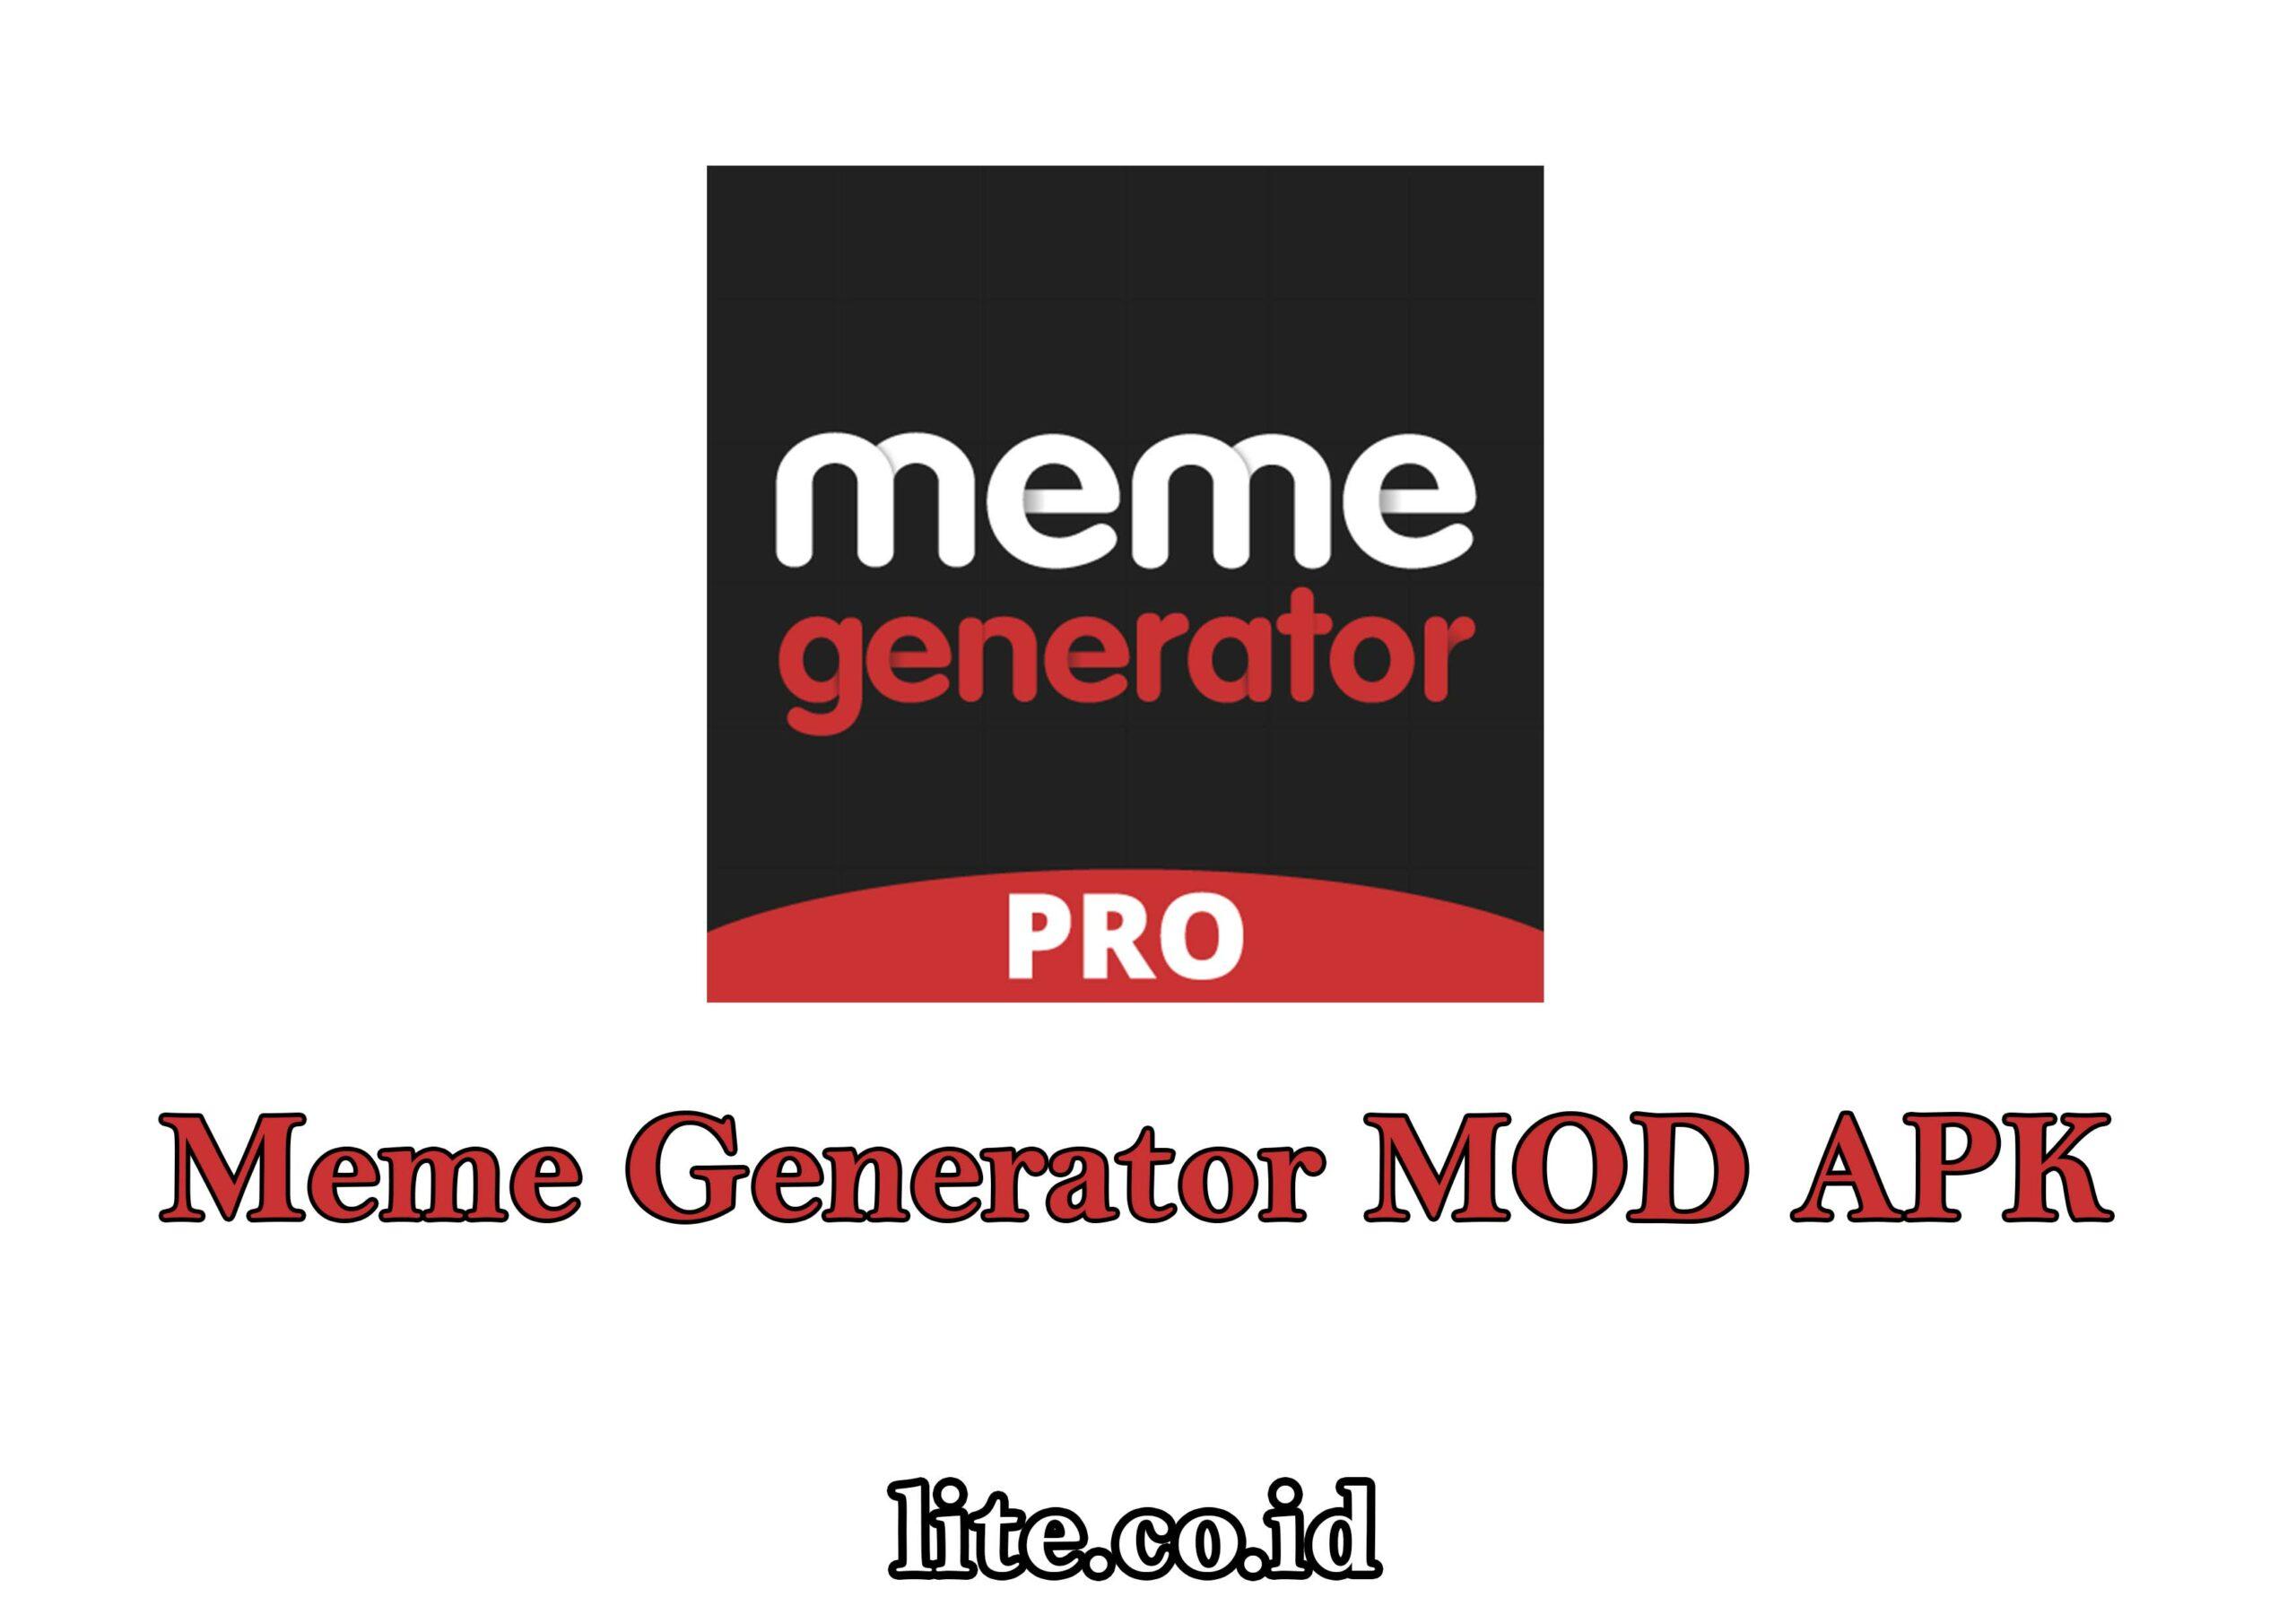 meme generator mod apk